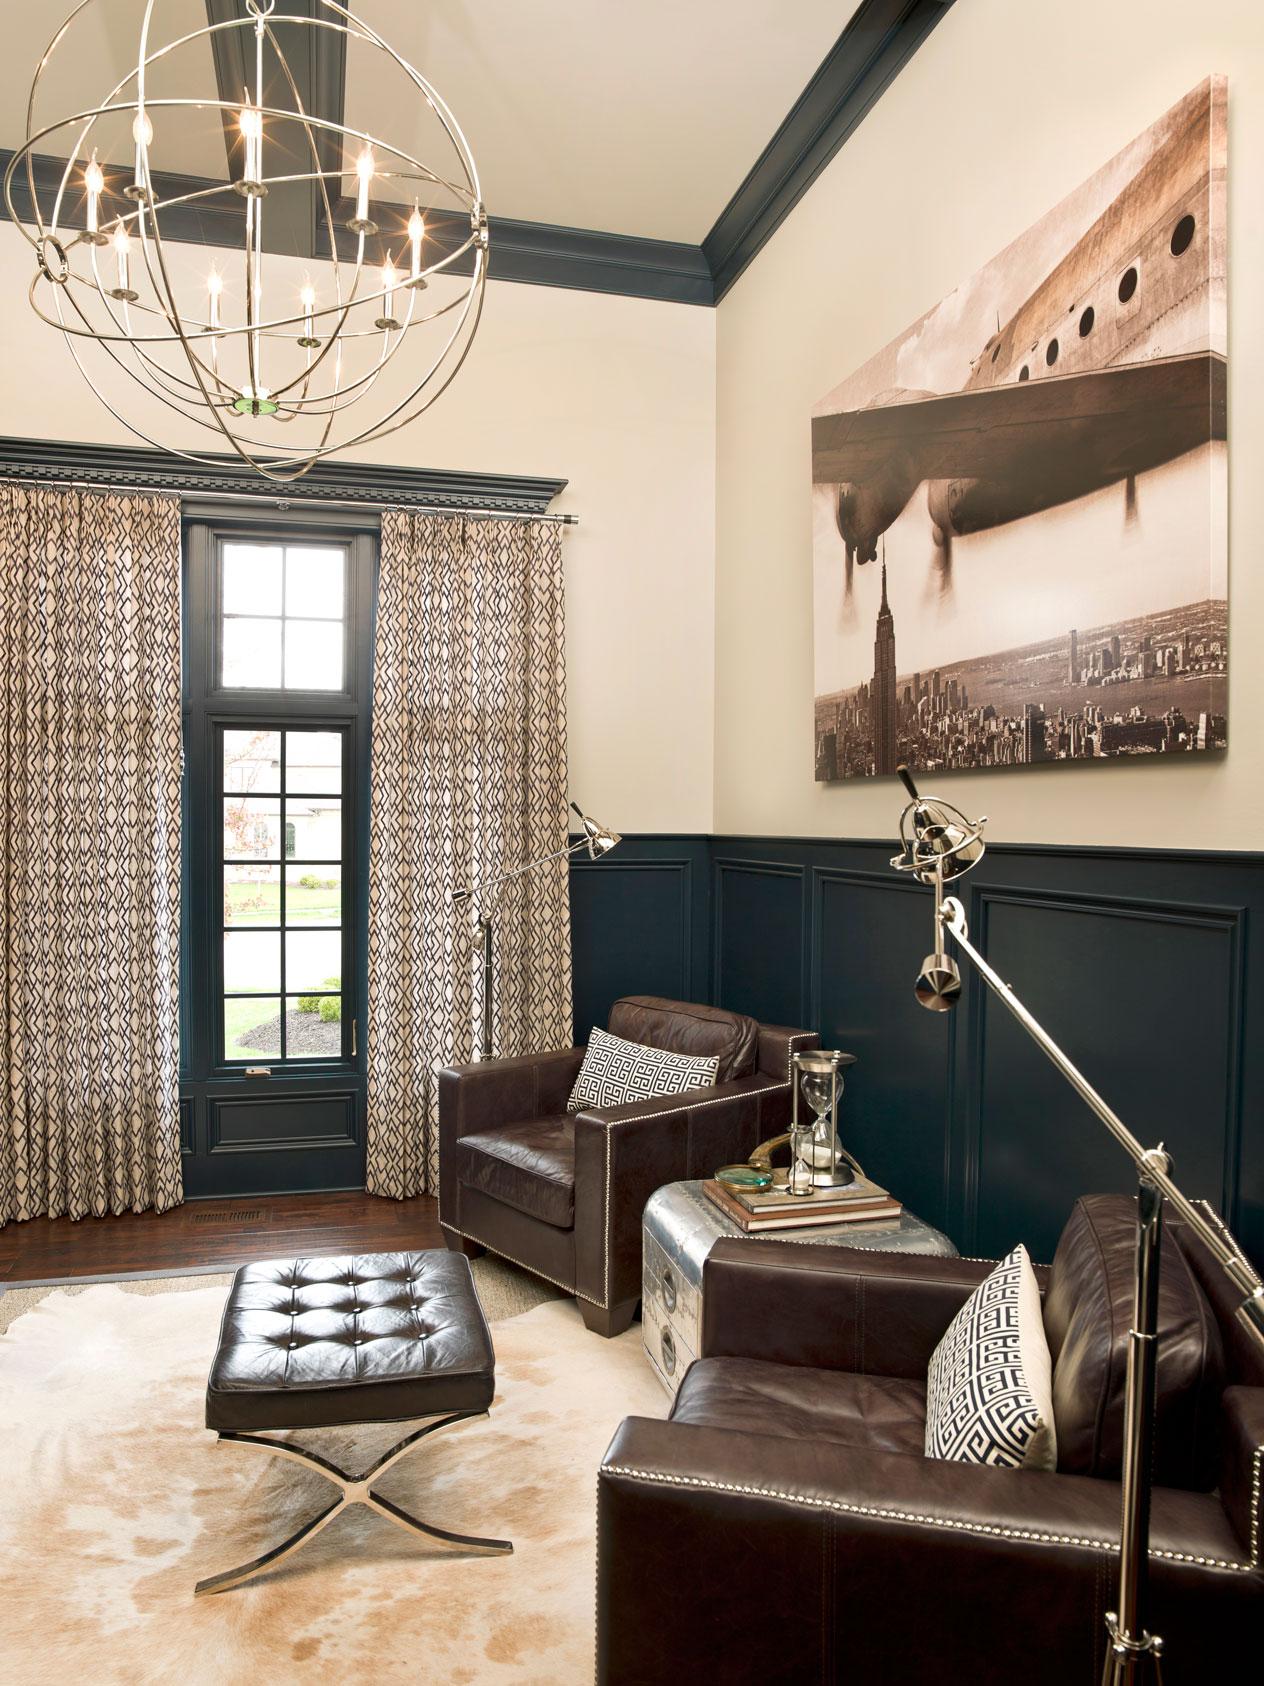 Courtney Casteel, Interior Design -sitting area